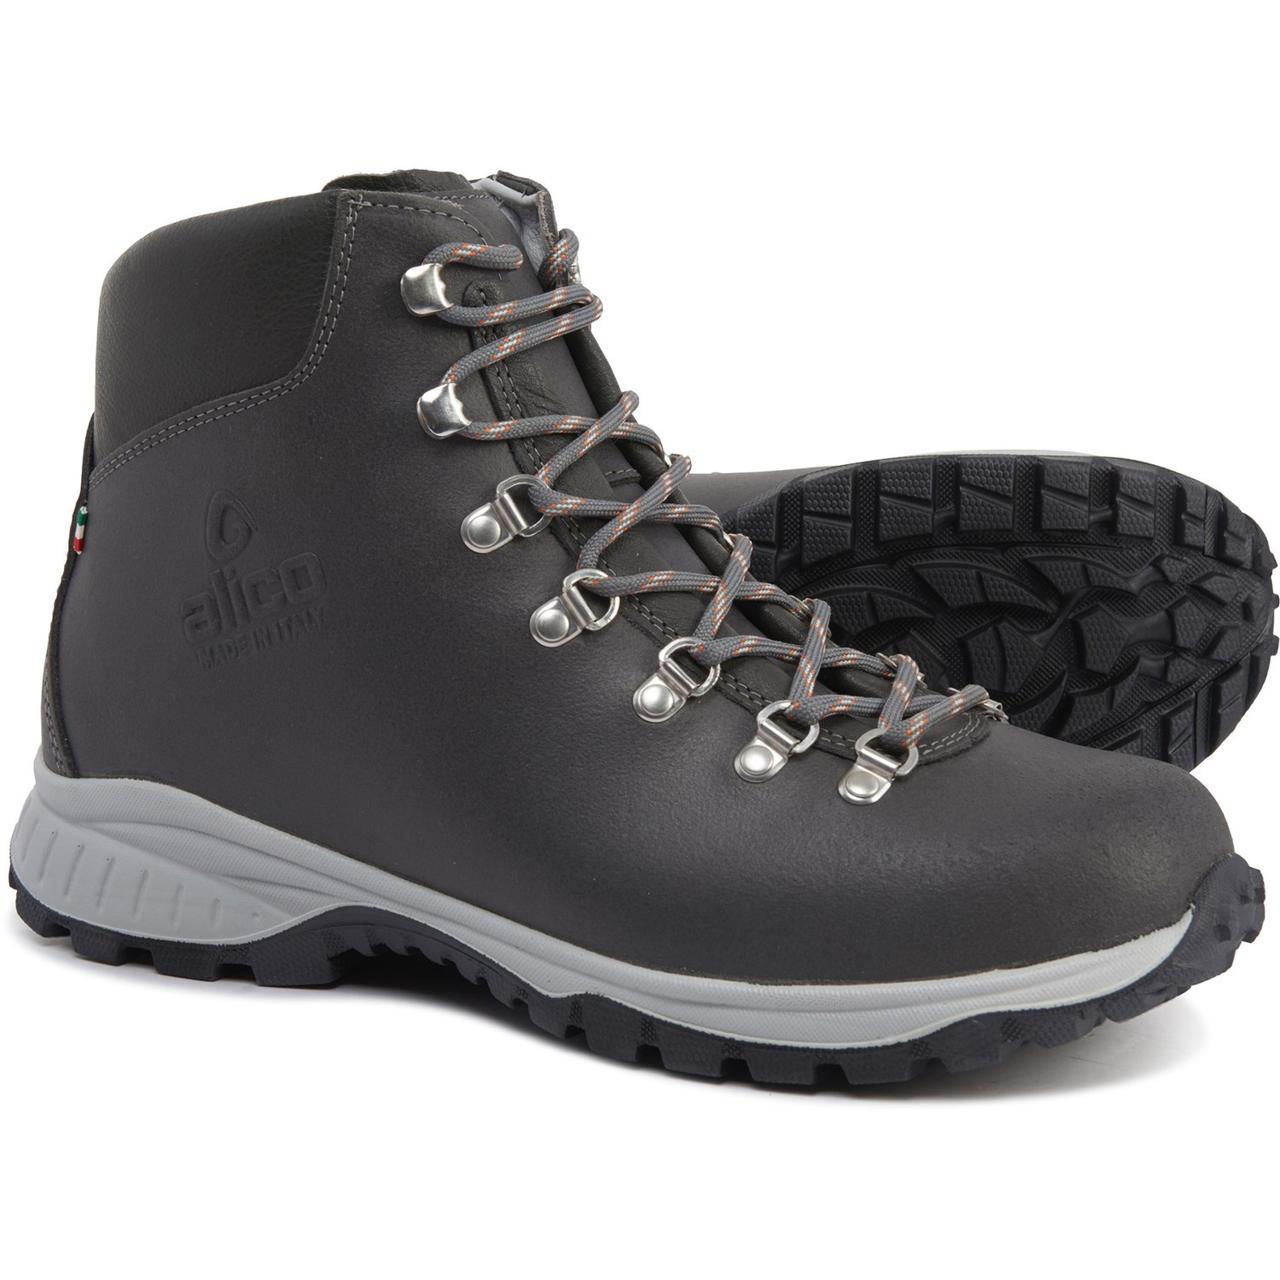 Ботинки трекинговые Alico Sherpa (Код ASHPG-44.5)